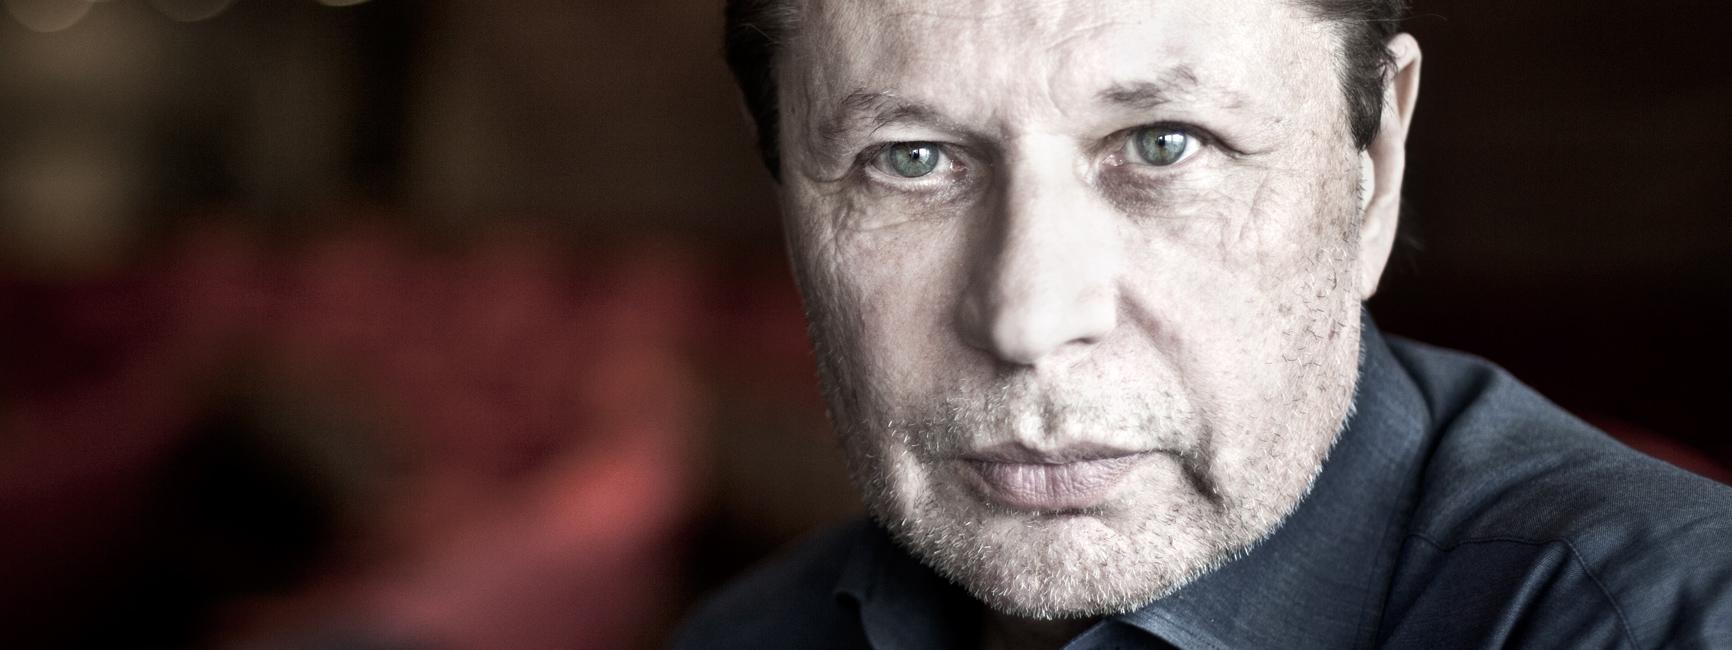 Porträttfotograf Stockholm